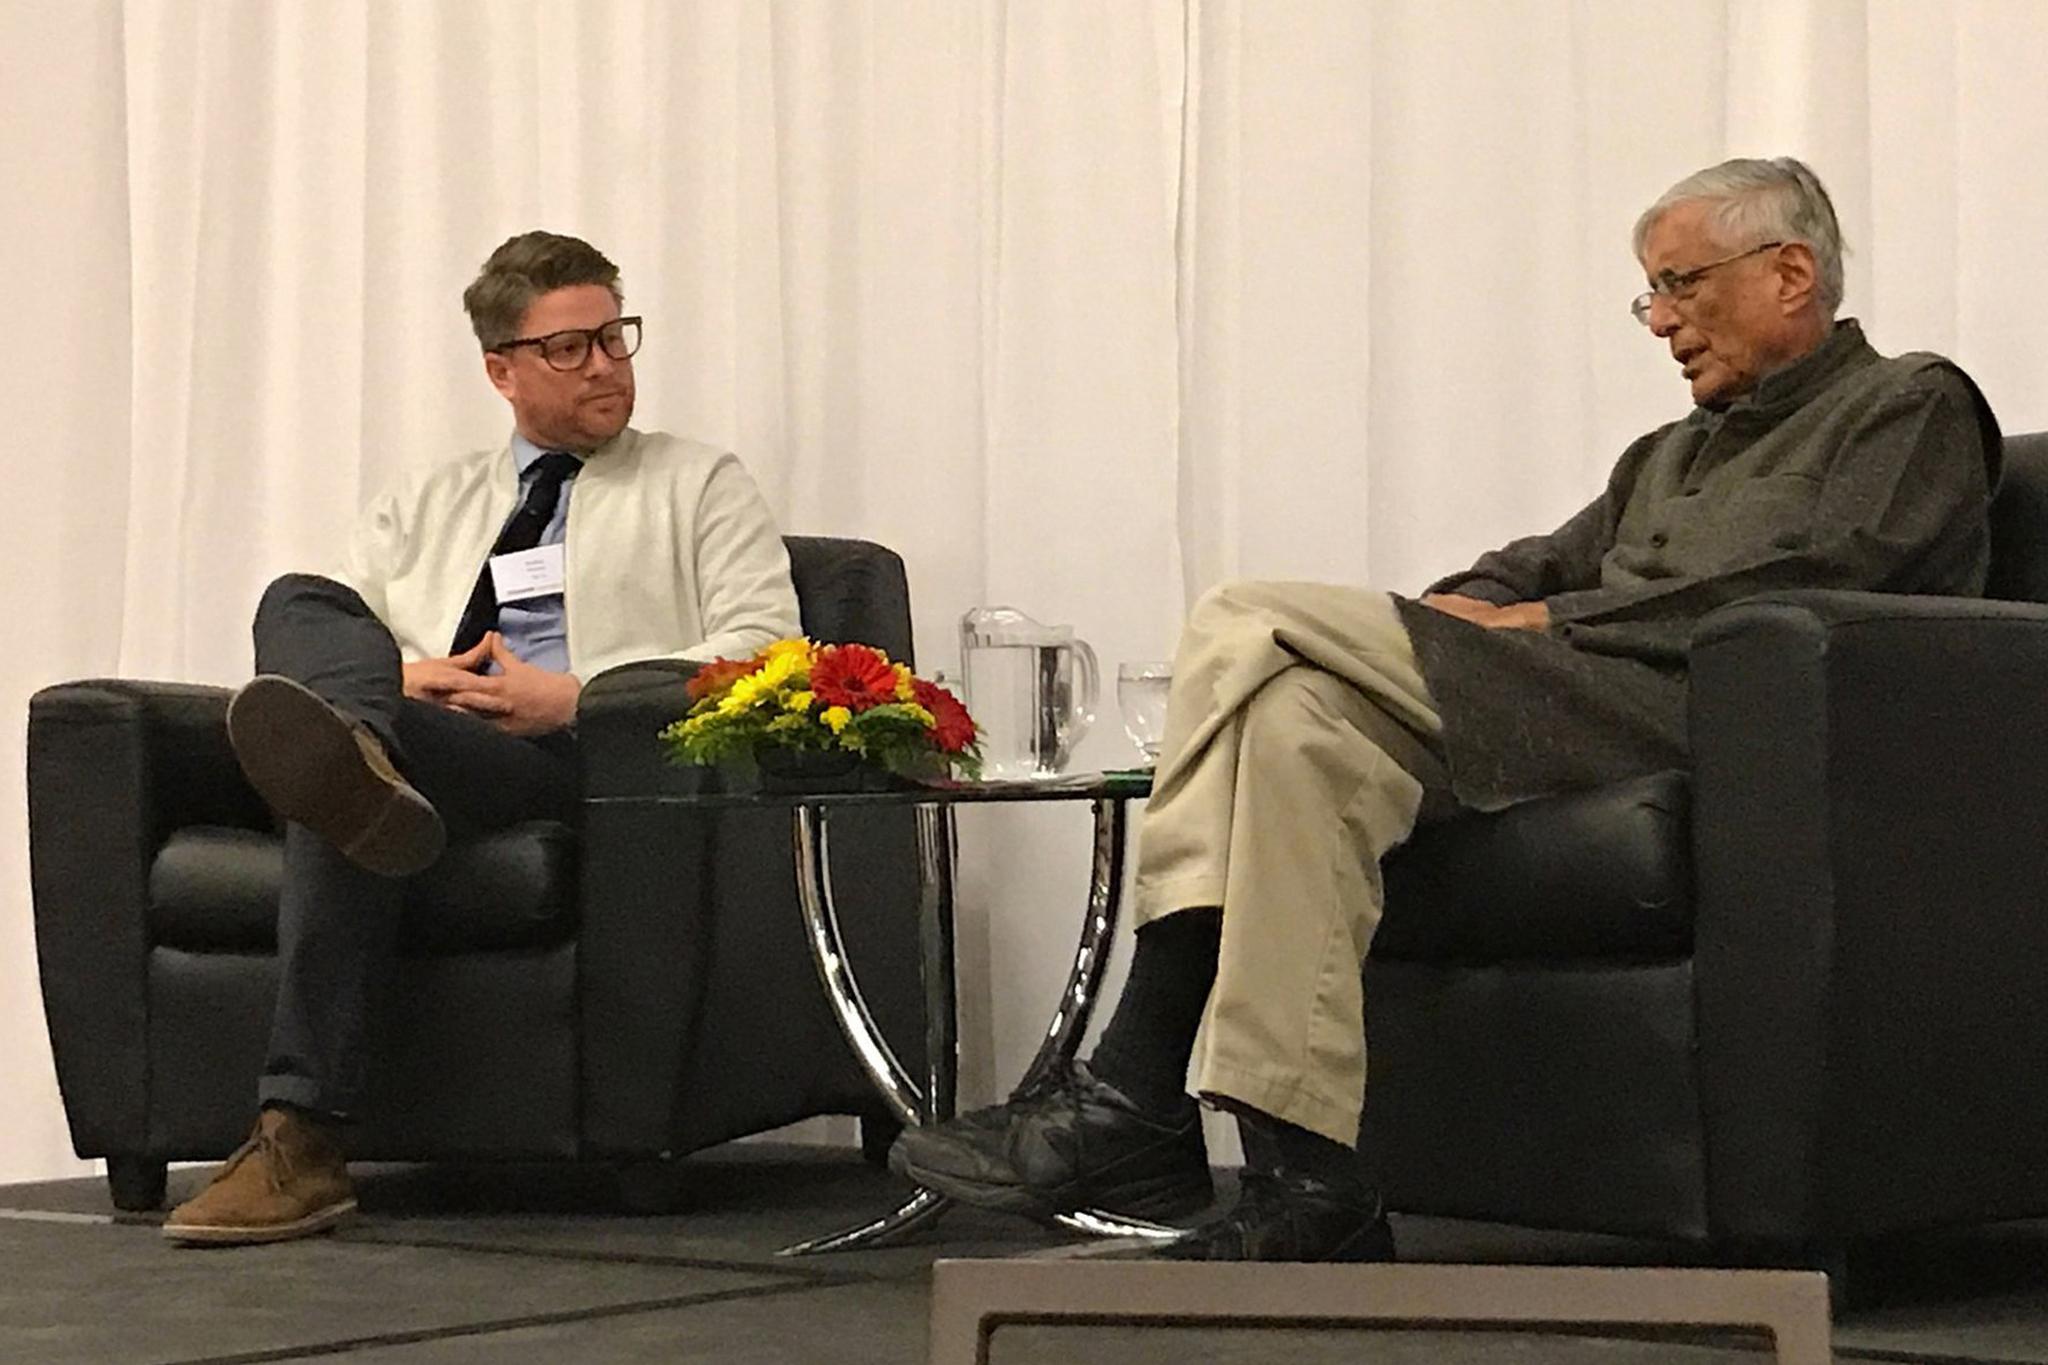 Interviewing Rajmohan Gandhi, grandson of Mahatma Gandhi, for UCalgary Alumni Weekend 2017.